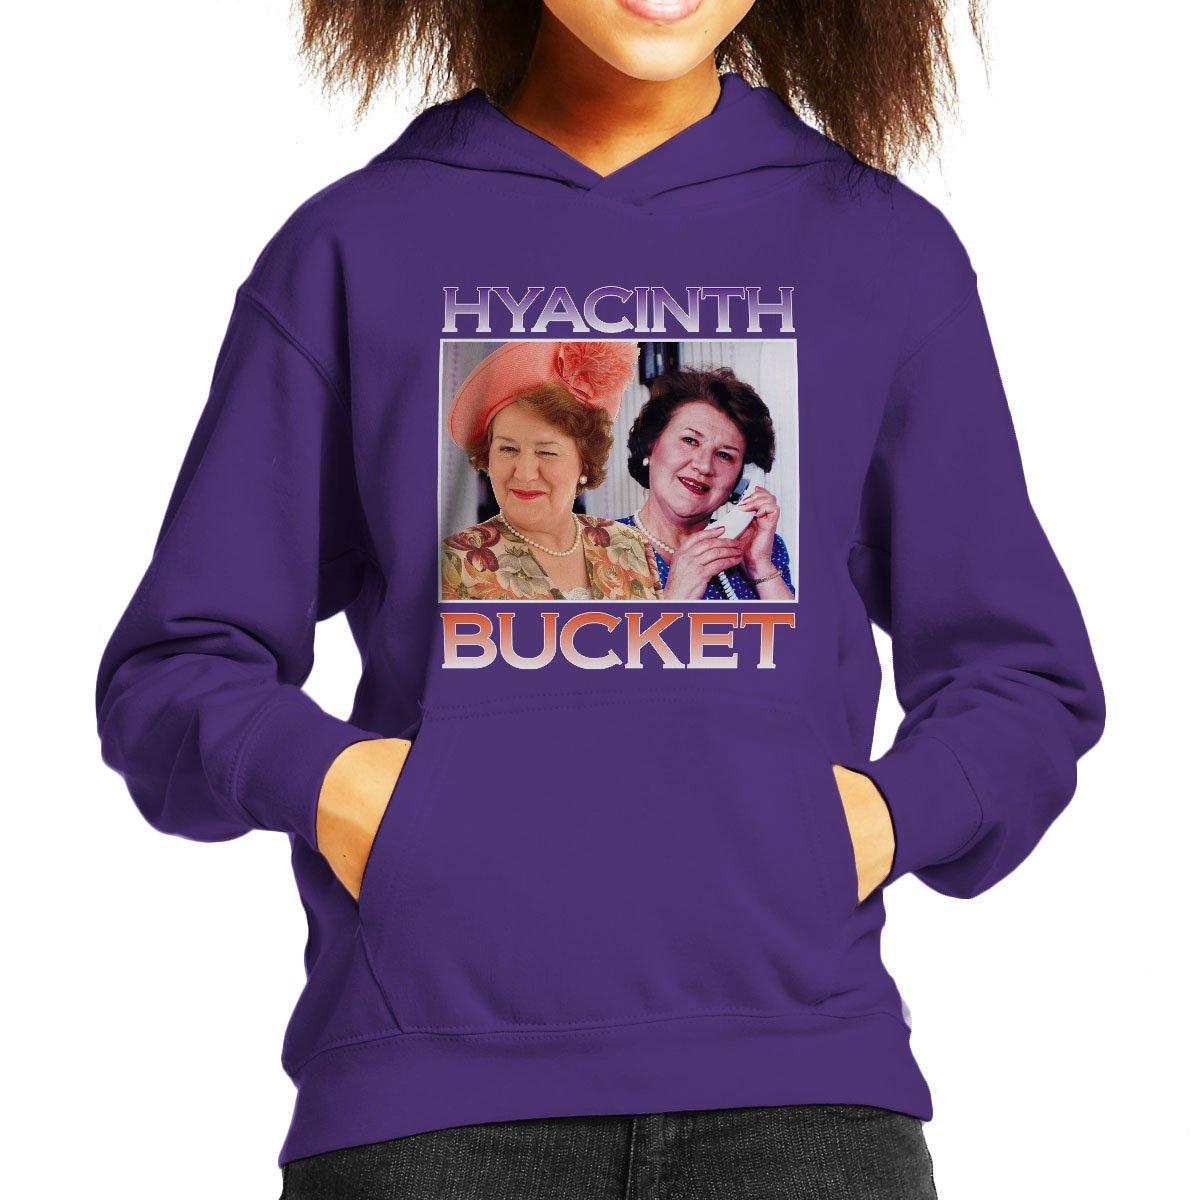 Coto7 Hyacinth Bucket Keeping up Appearances Montage Kids Hooded Sweatshirt